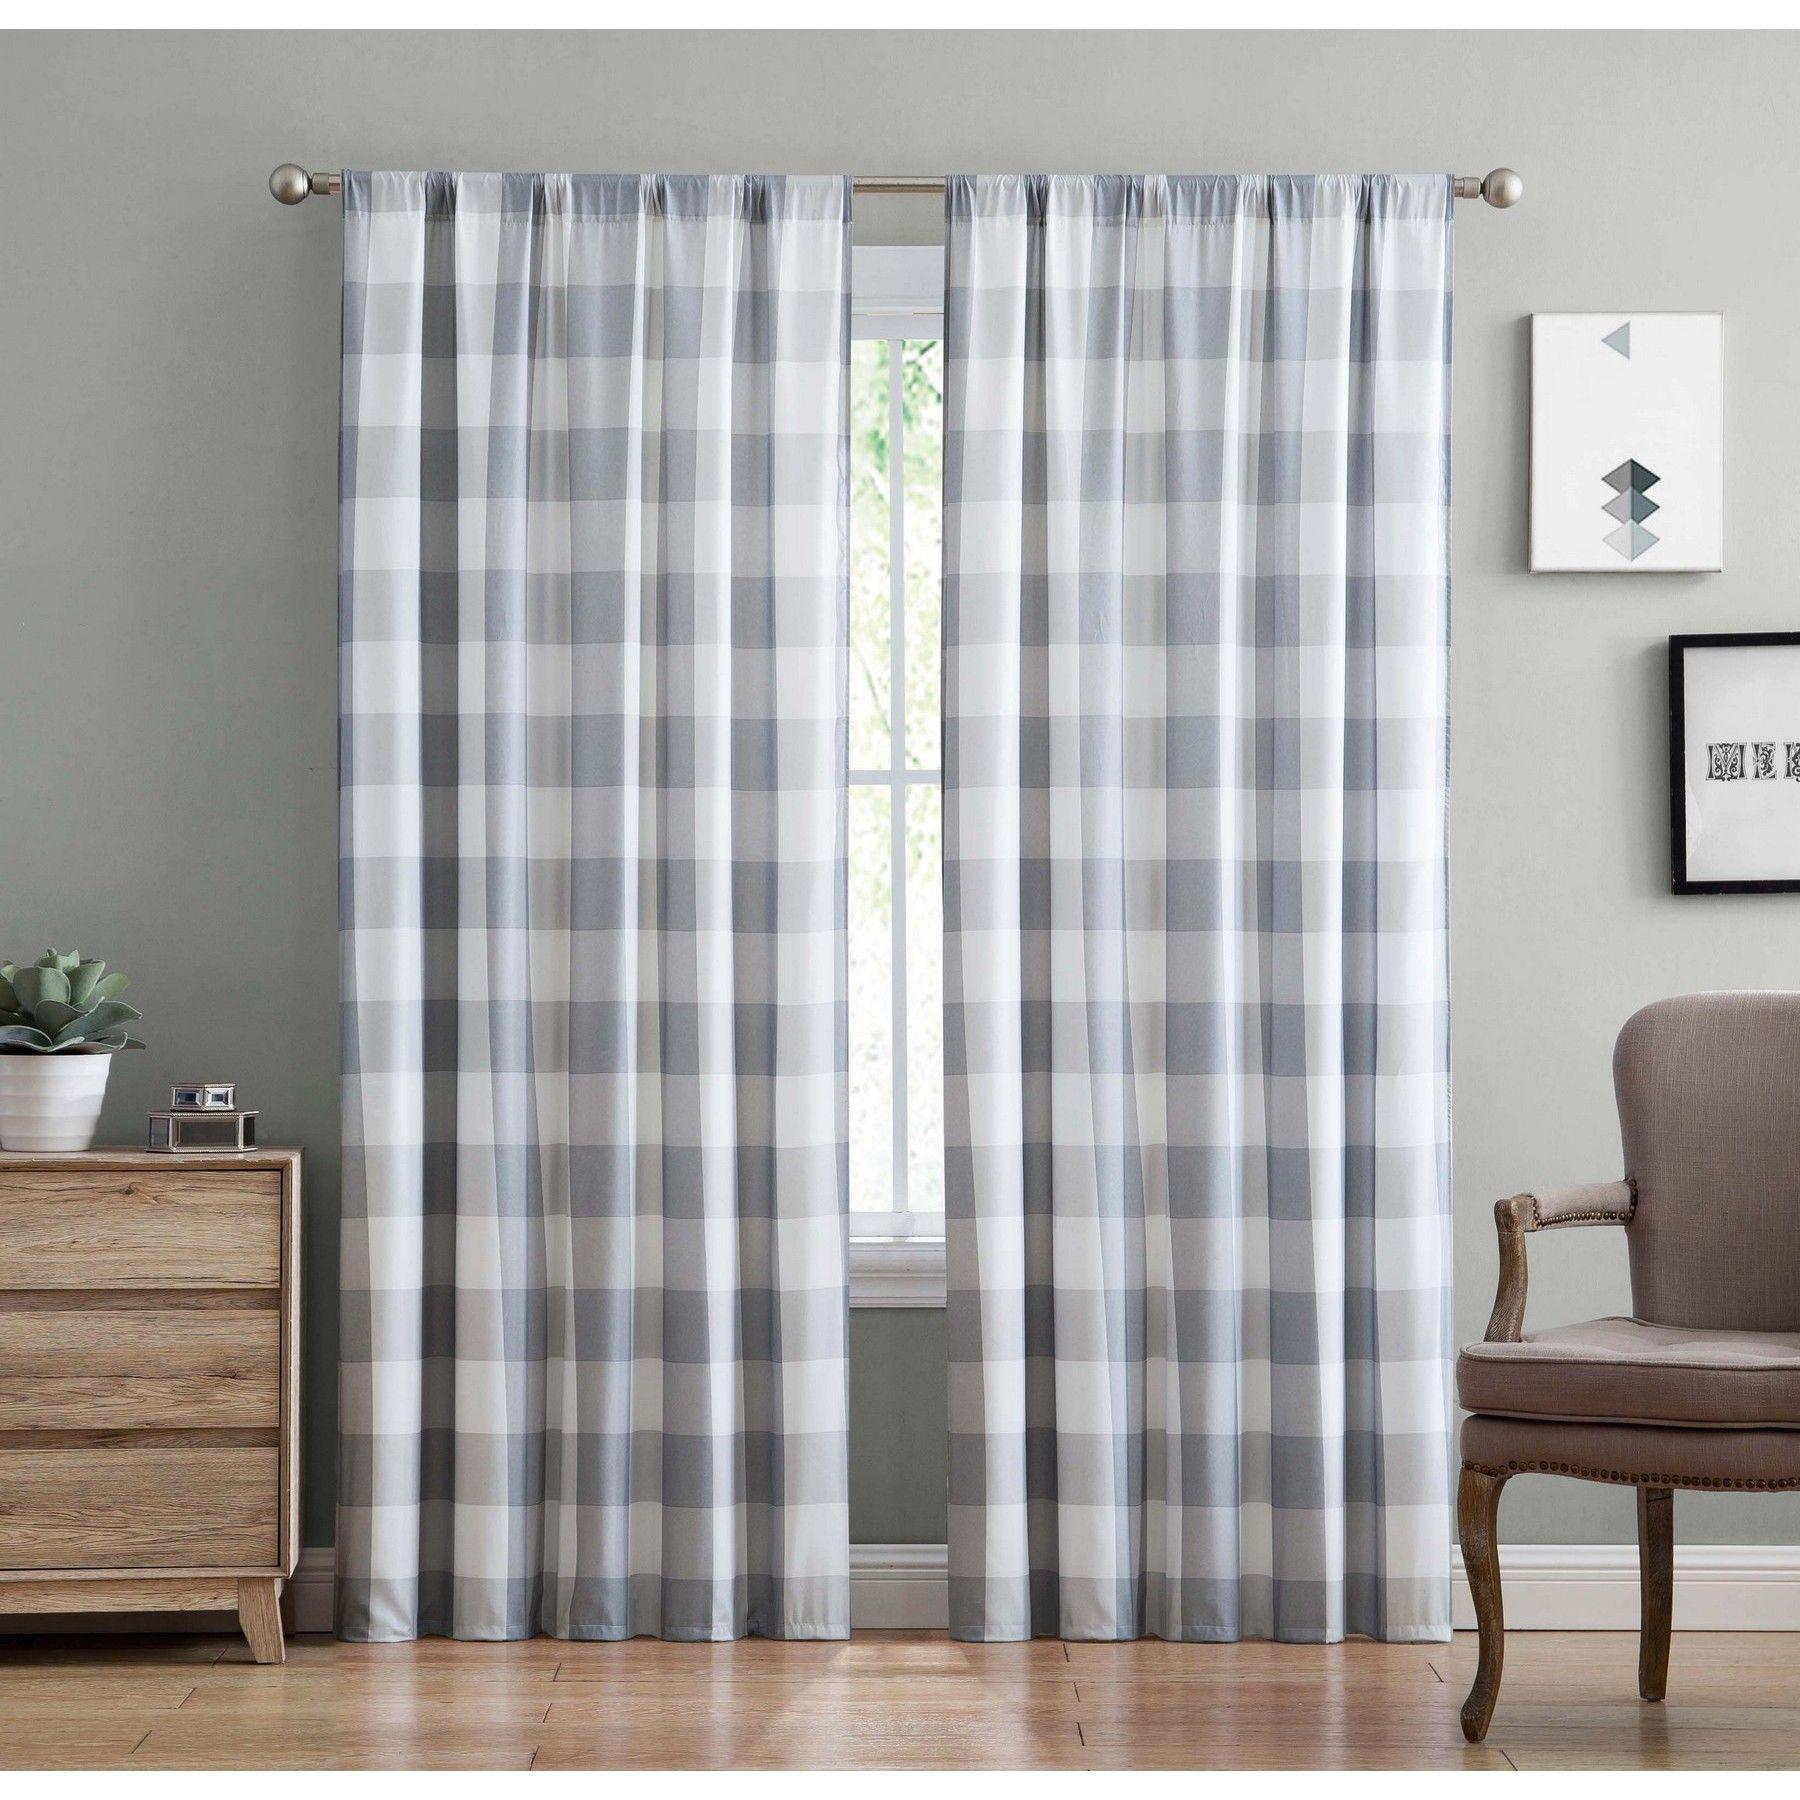 Truly Soft Everyday Buffalo Plaid Gray Drape Set Grey And White Curtains Plaid Curtains Buffalo Plaid Curtains